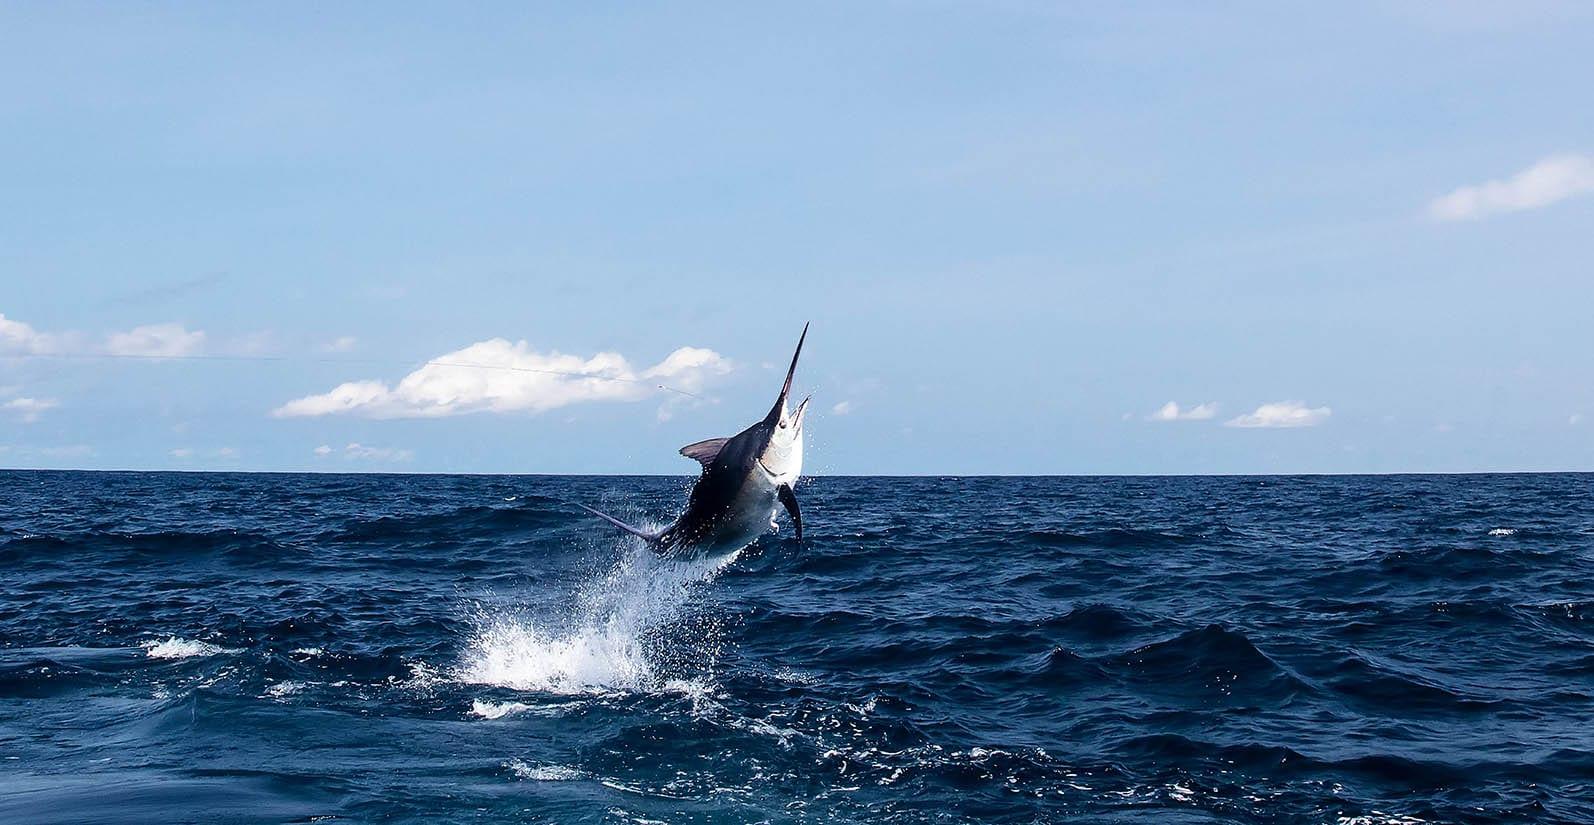 Cala Mia sportfishing in Panama